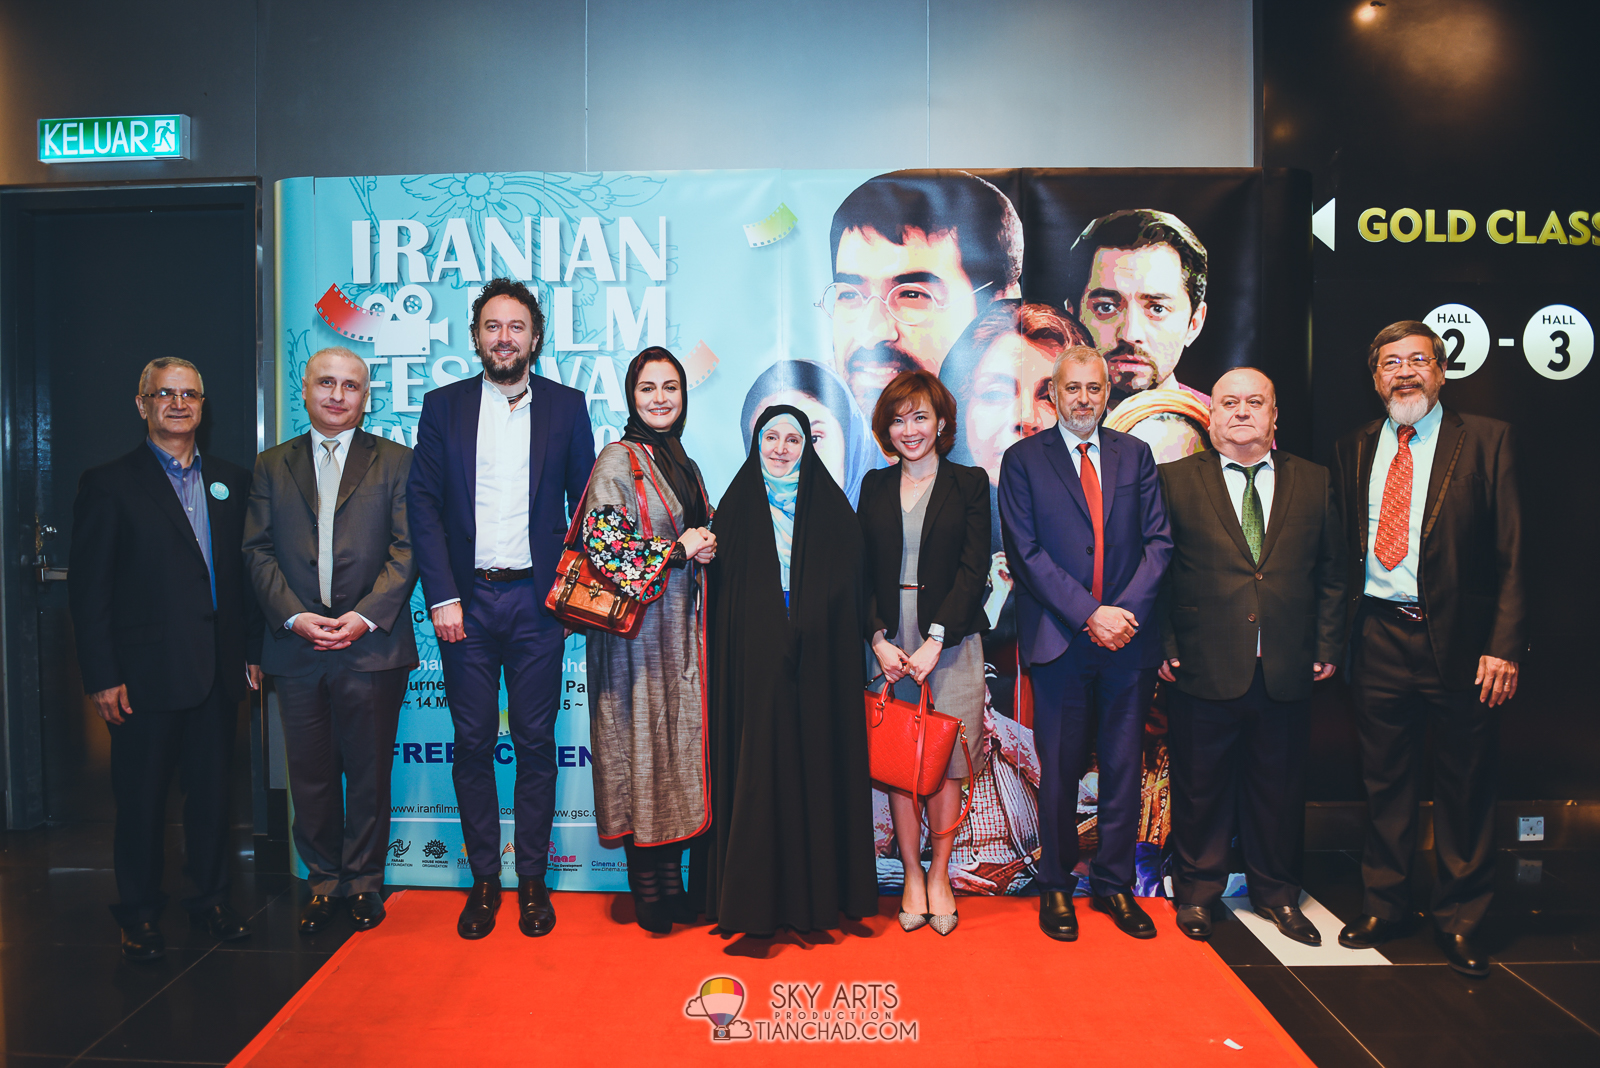 Iranian Film Festival 2018 Malaysia @ GSC Pavilion KL